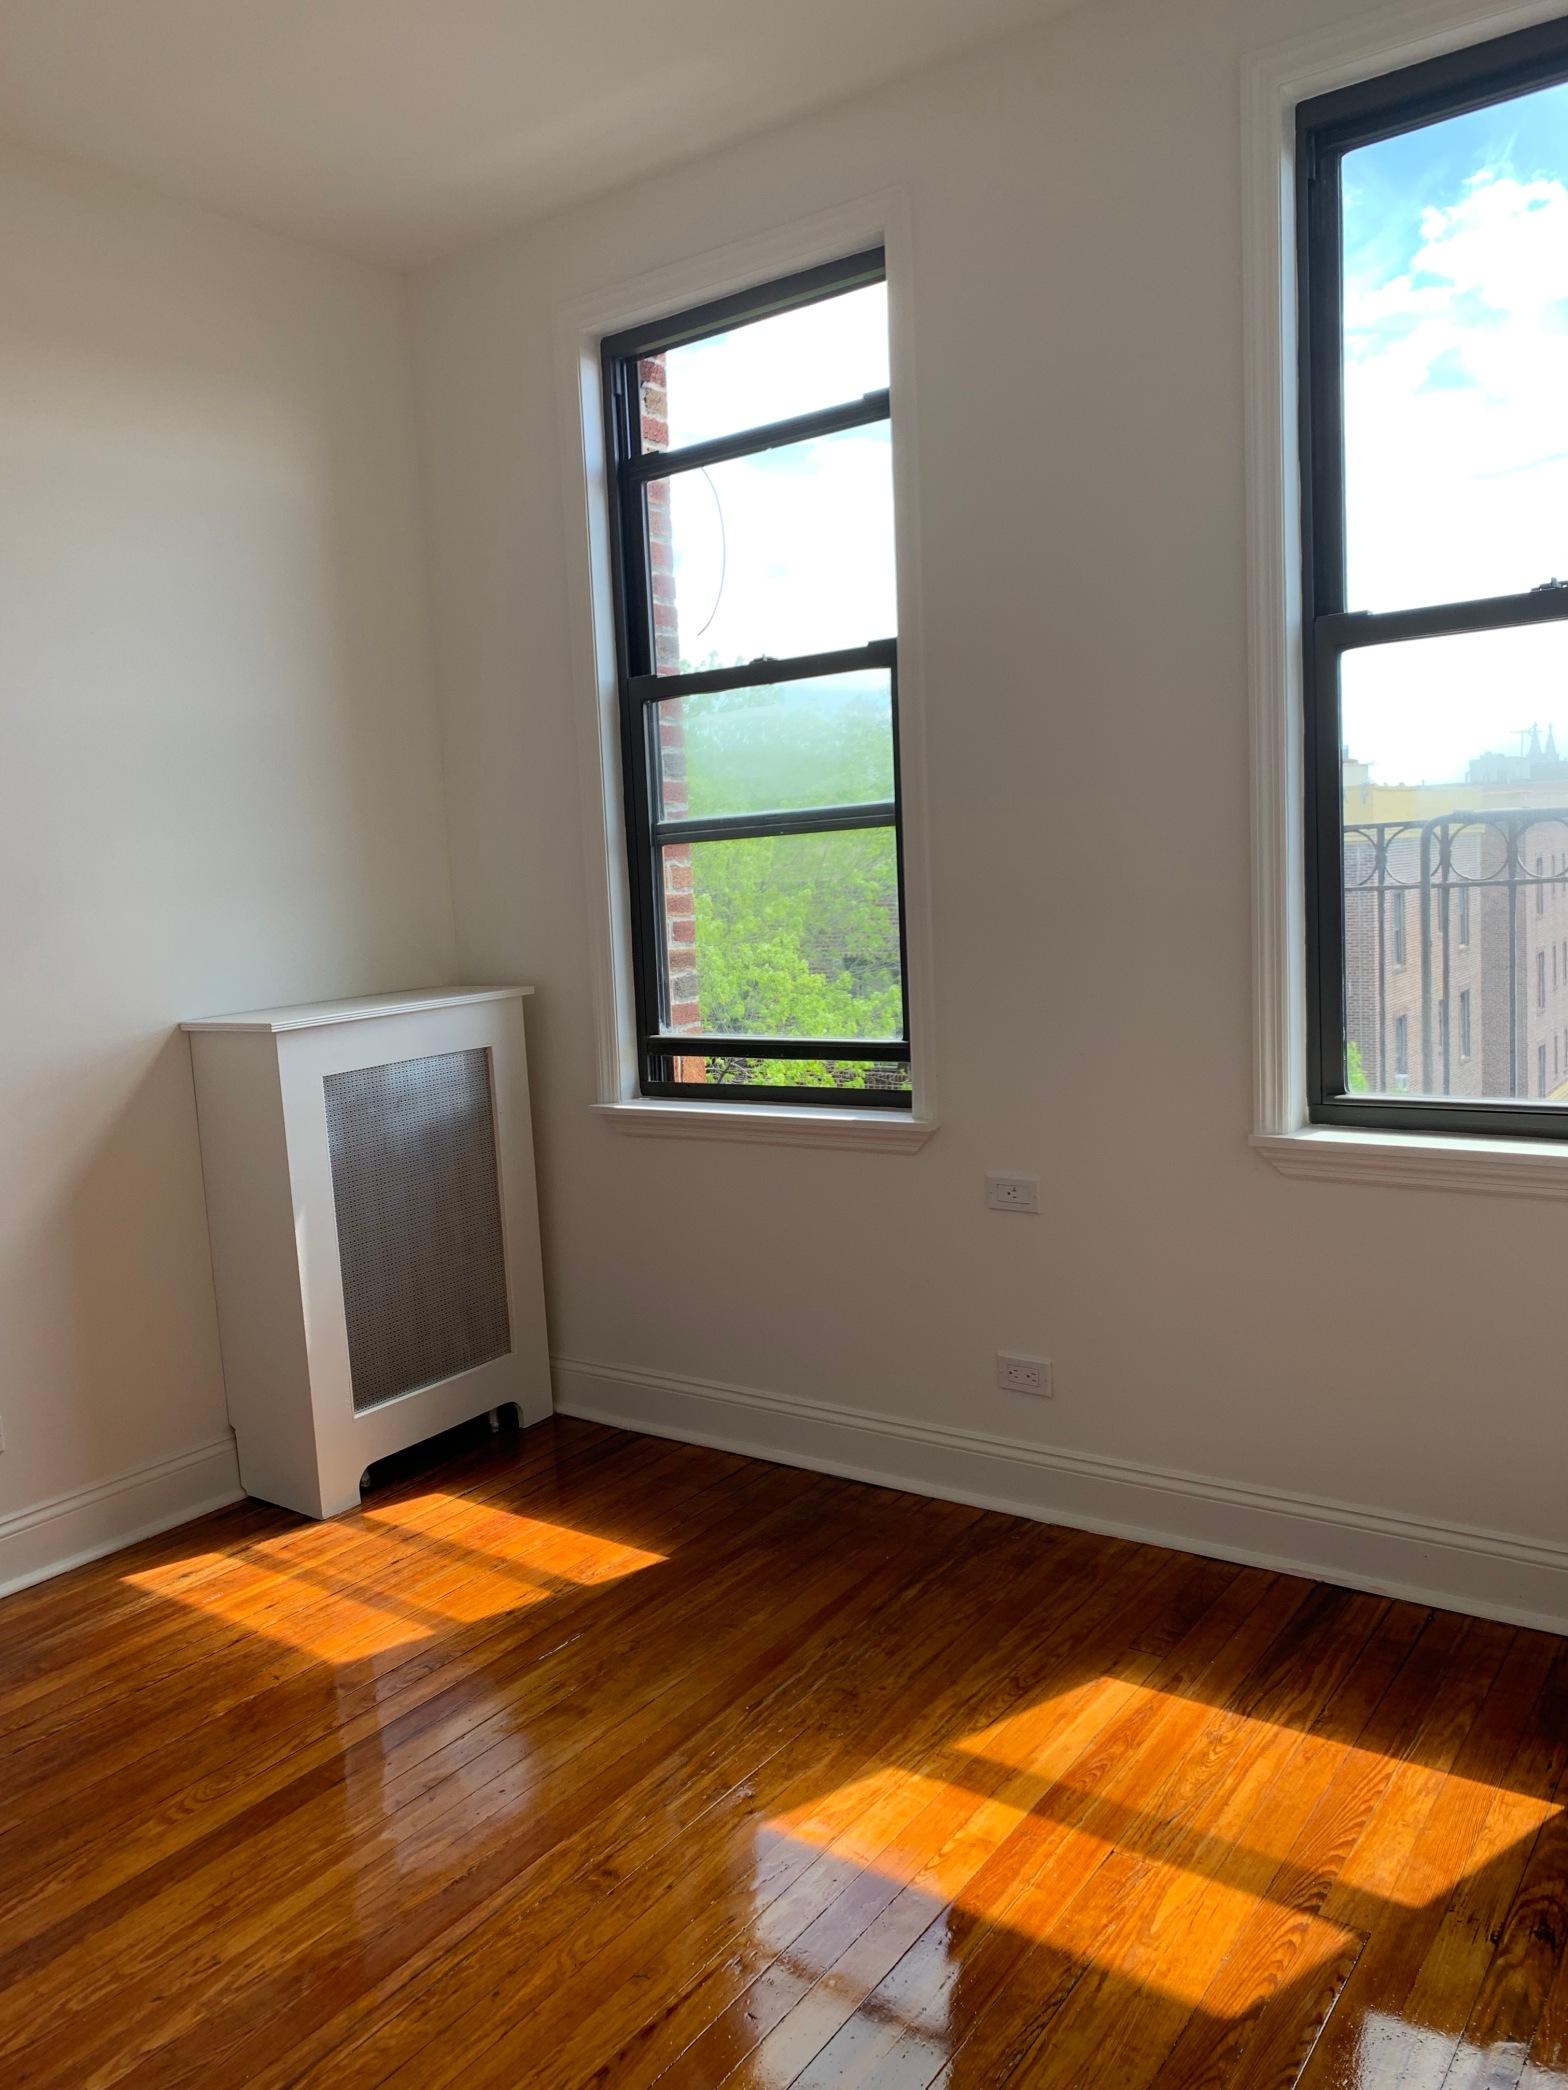 Apartments For Rent Astoria Manhattan Queens Real Estate Broker